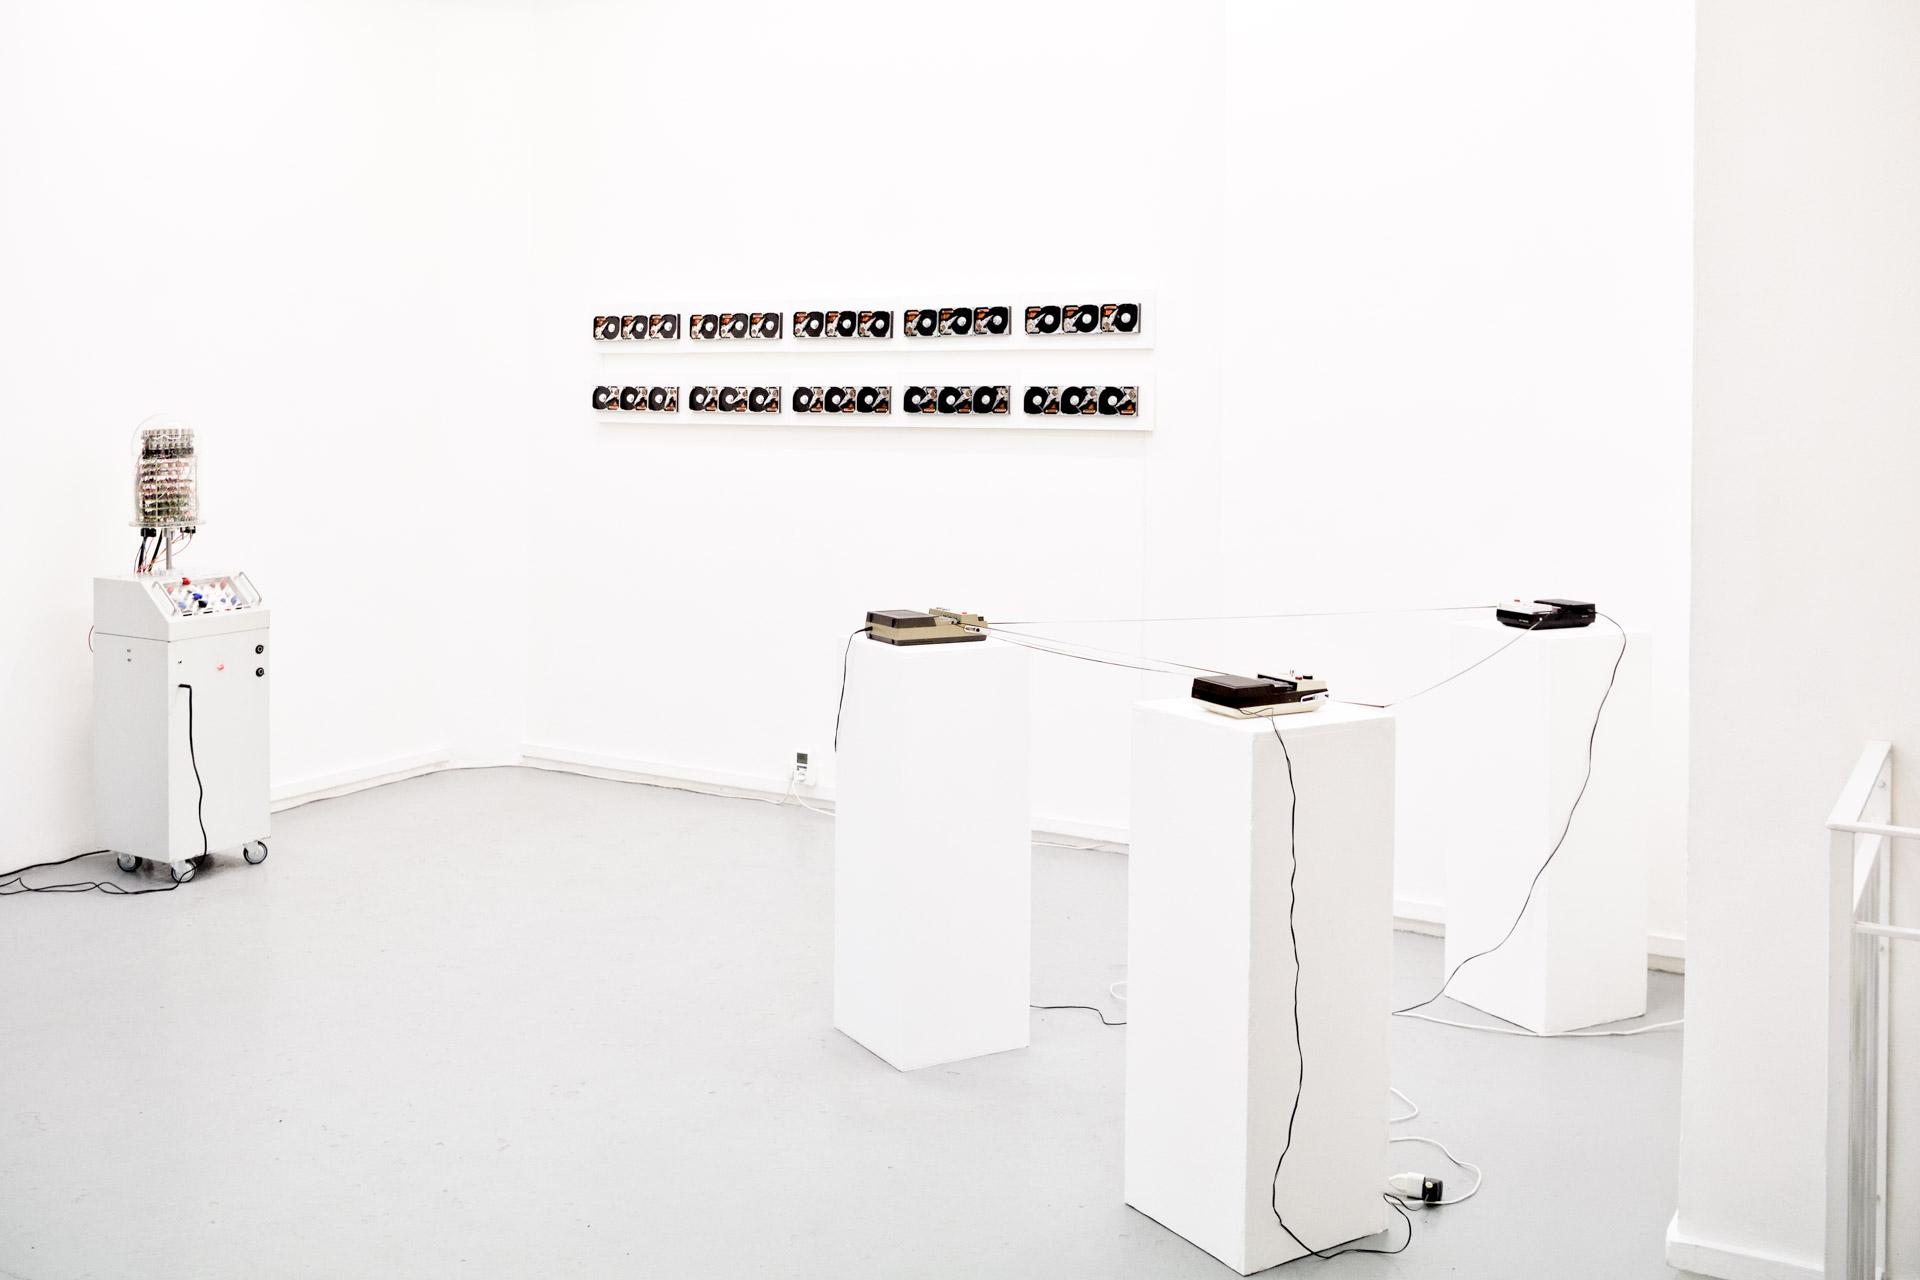 15 avril 2018 Dataline, hdmusic, installation, work5